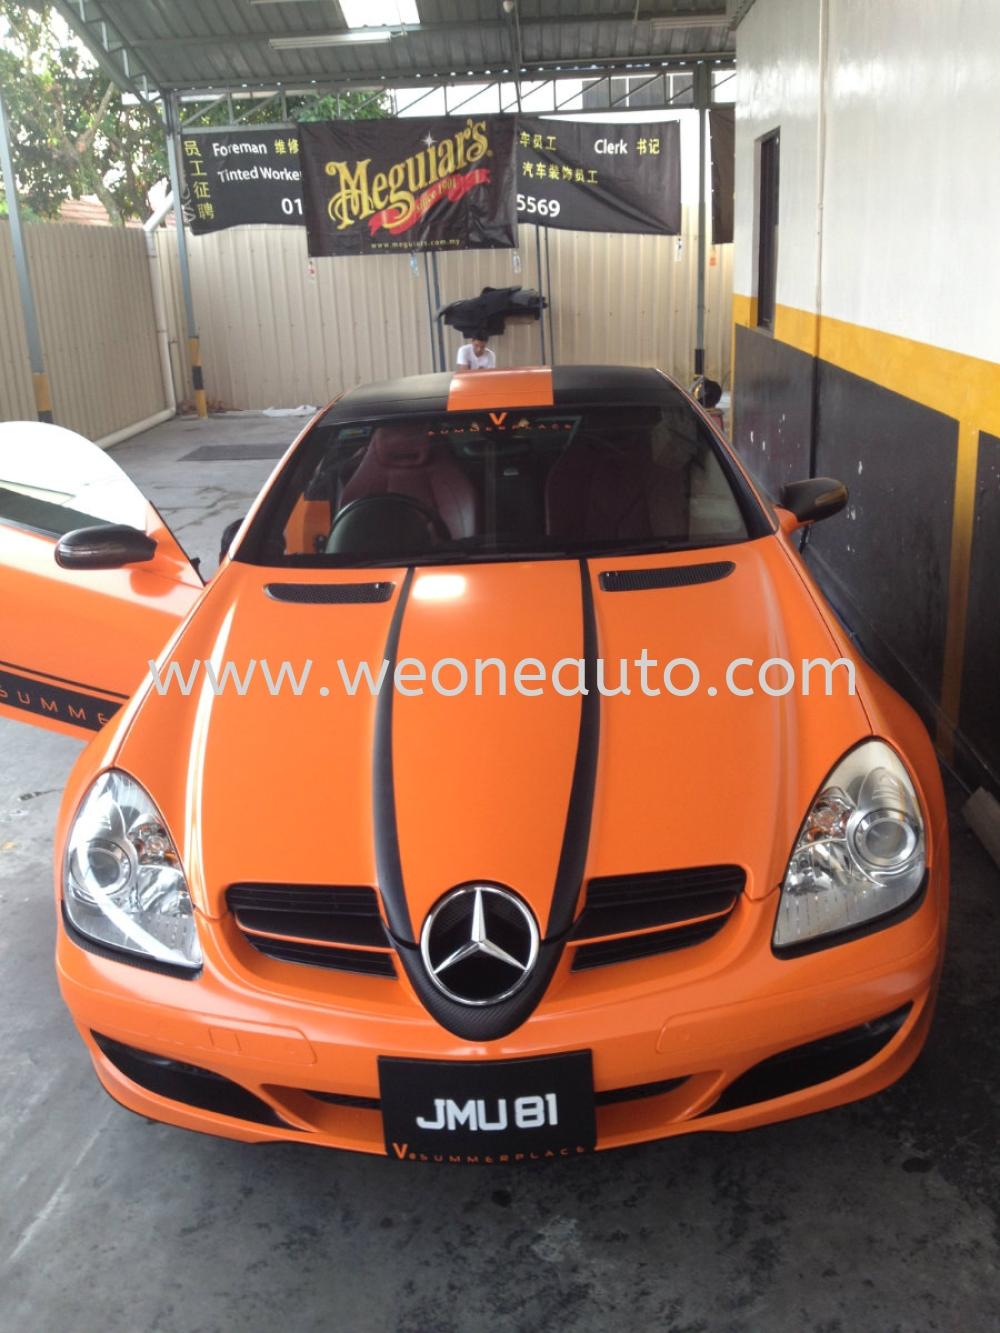 Car sticker design jb - Slk Orange Colour Sticker Car Sticker Design Johor Bahru Jb Johor Malaysia Supplier Suppliers Supply Supplies We One Auto Station Sdn Bhd